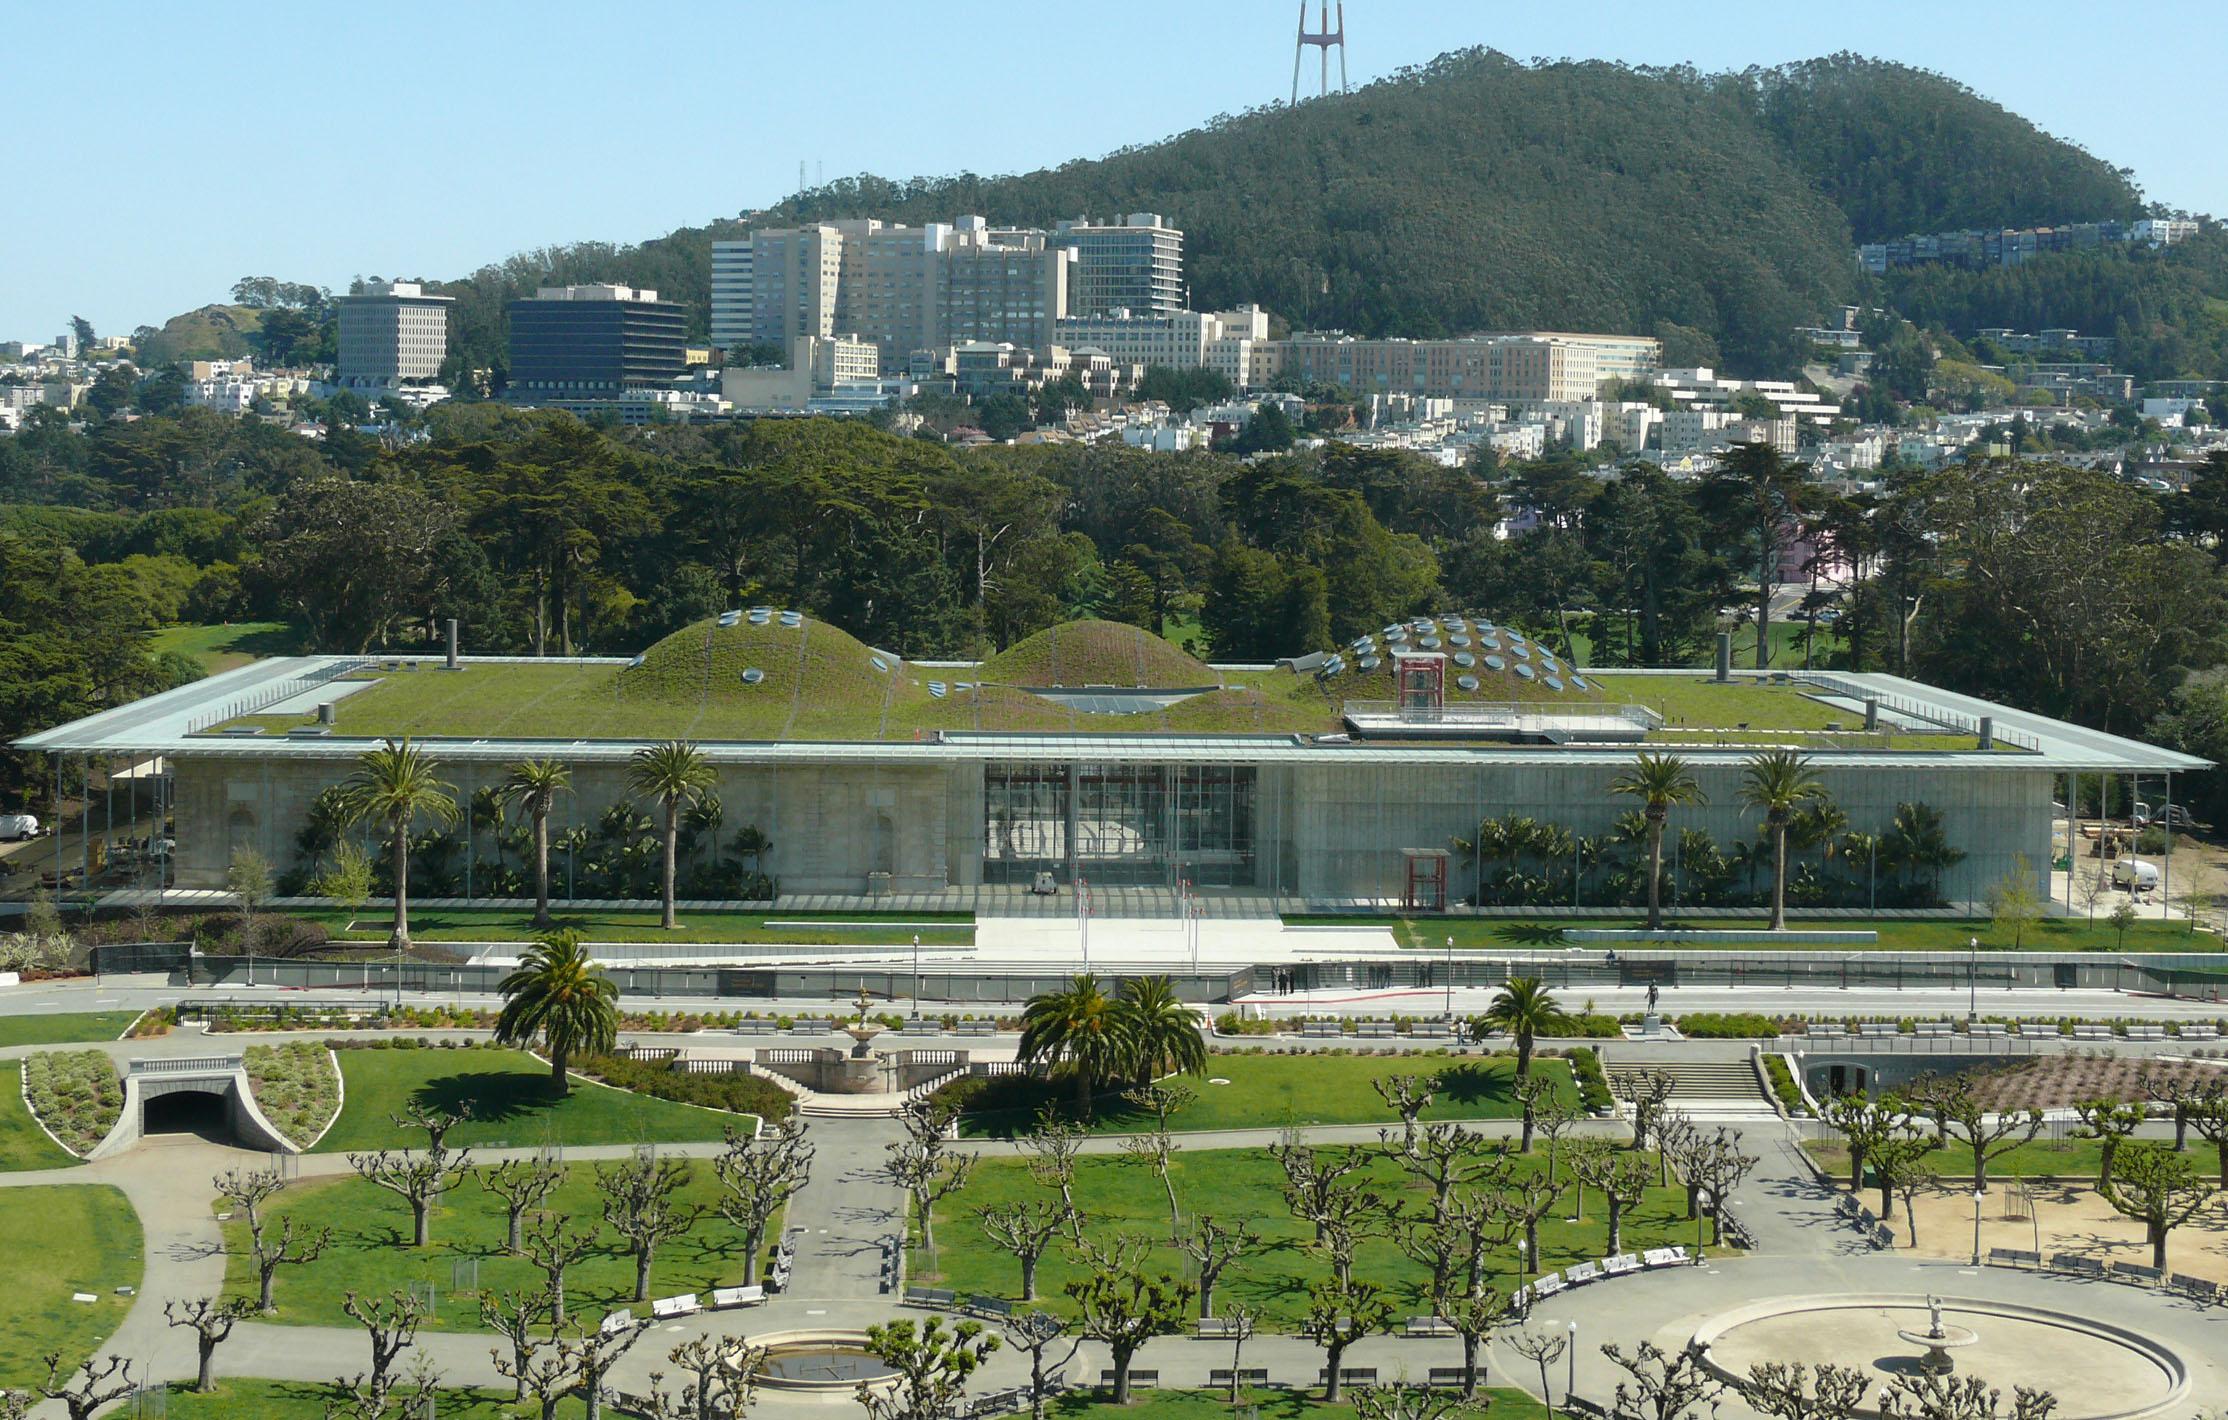 California Academy of Arts and Sciences - San Francisco